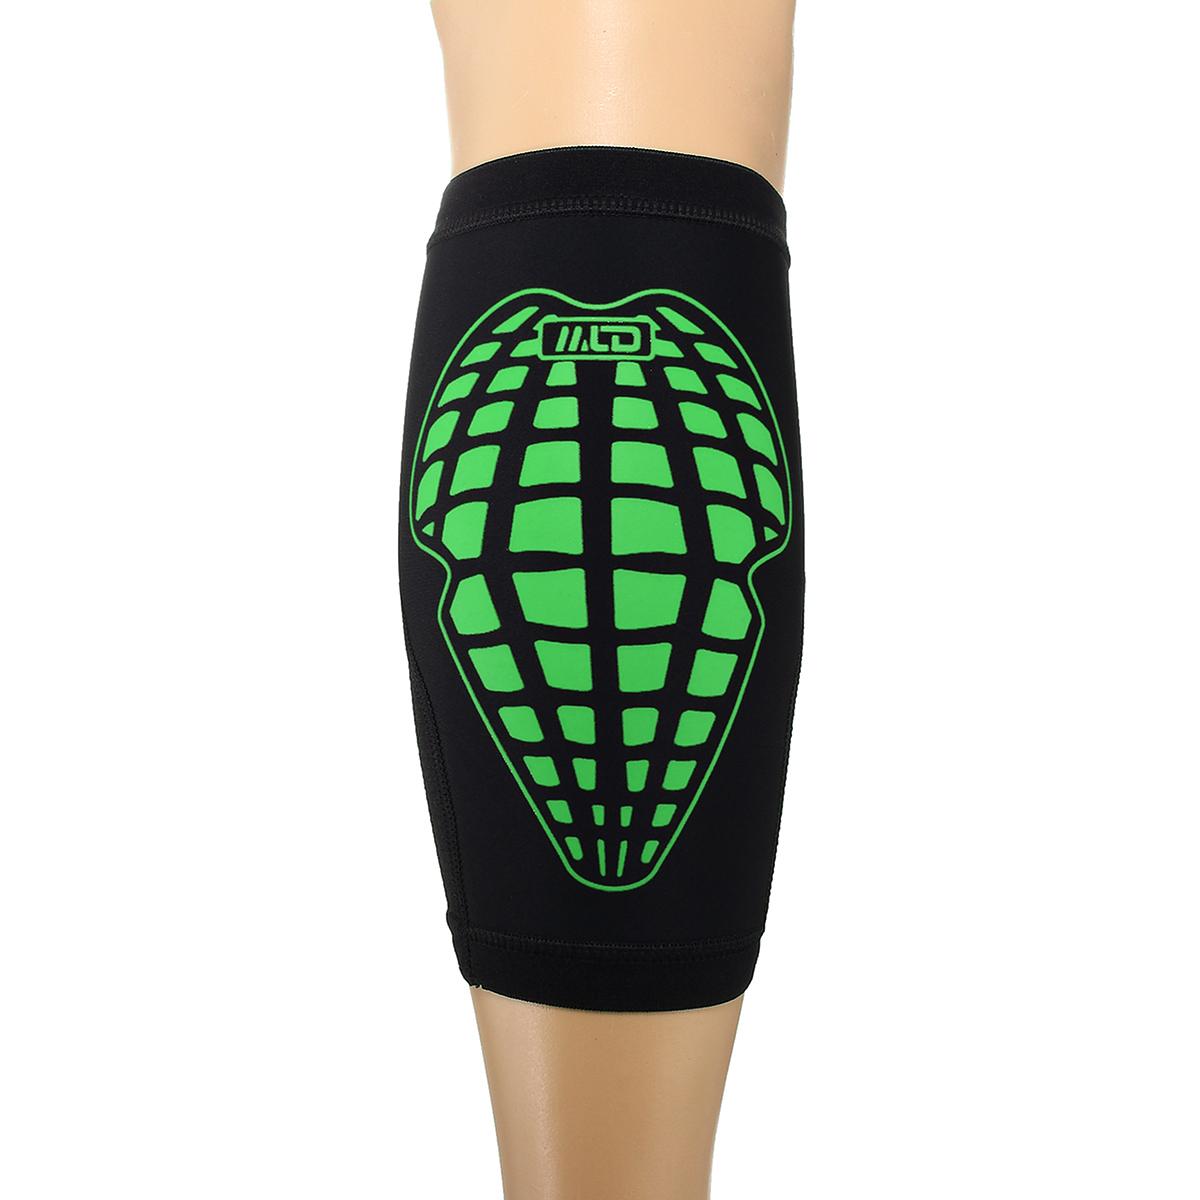 Single Basketball Running Shinguard Kneepad Calf Sleeve Sports Fitness Movement Protector